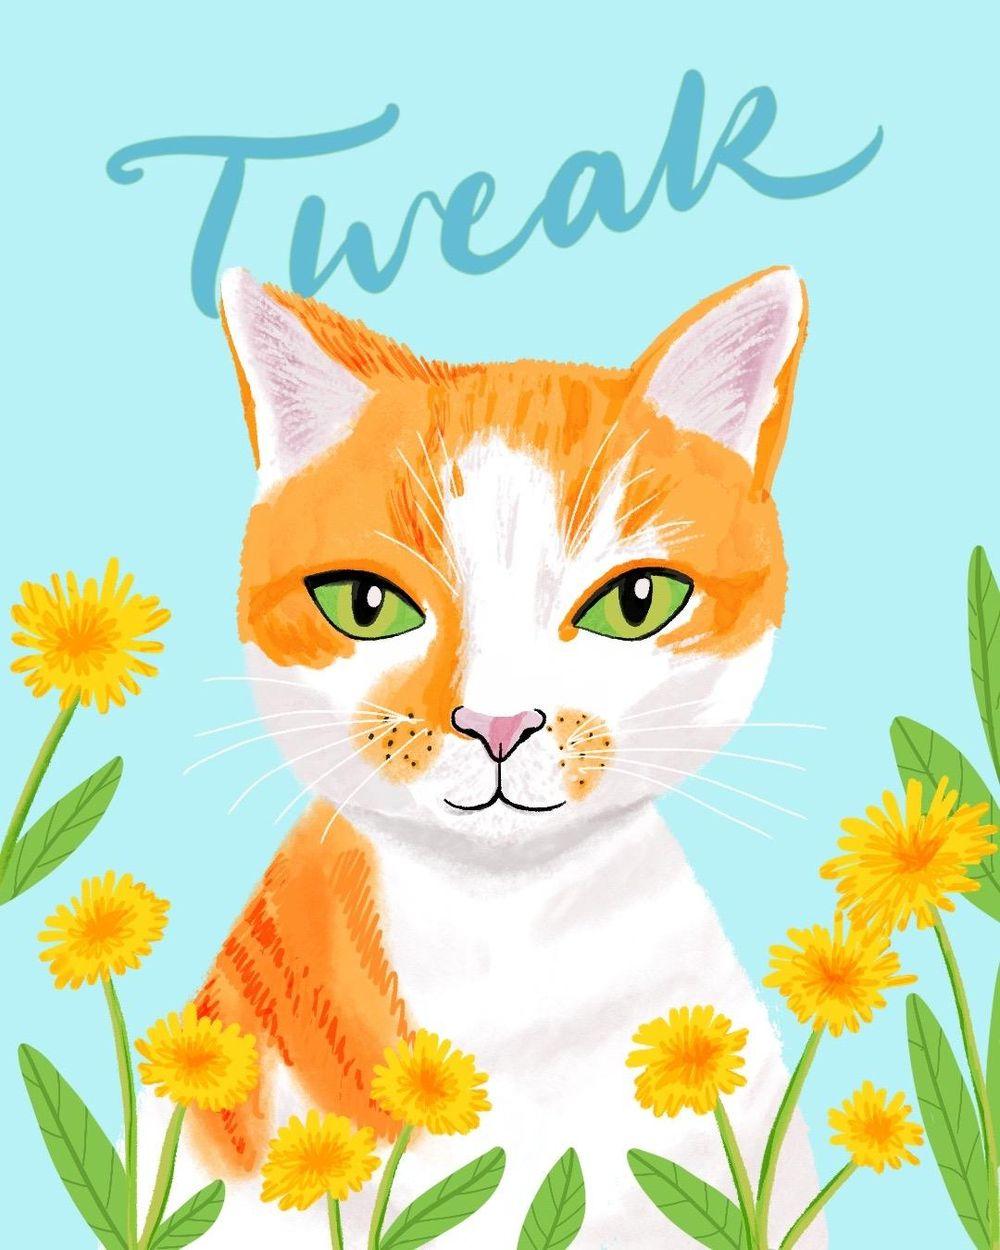 In Memory of Tweak - image 1 - student project